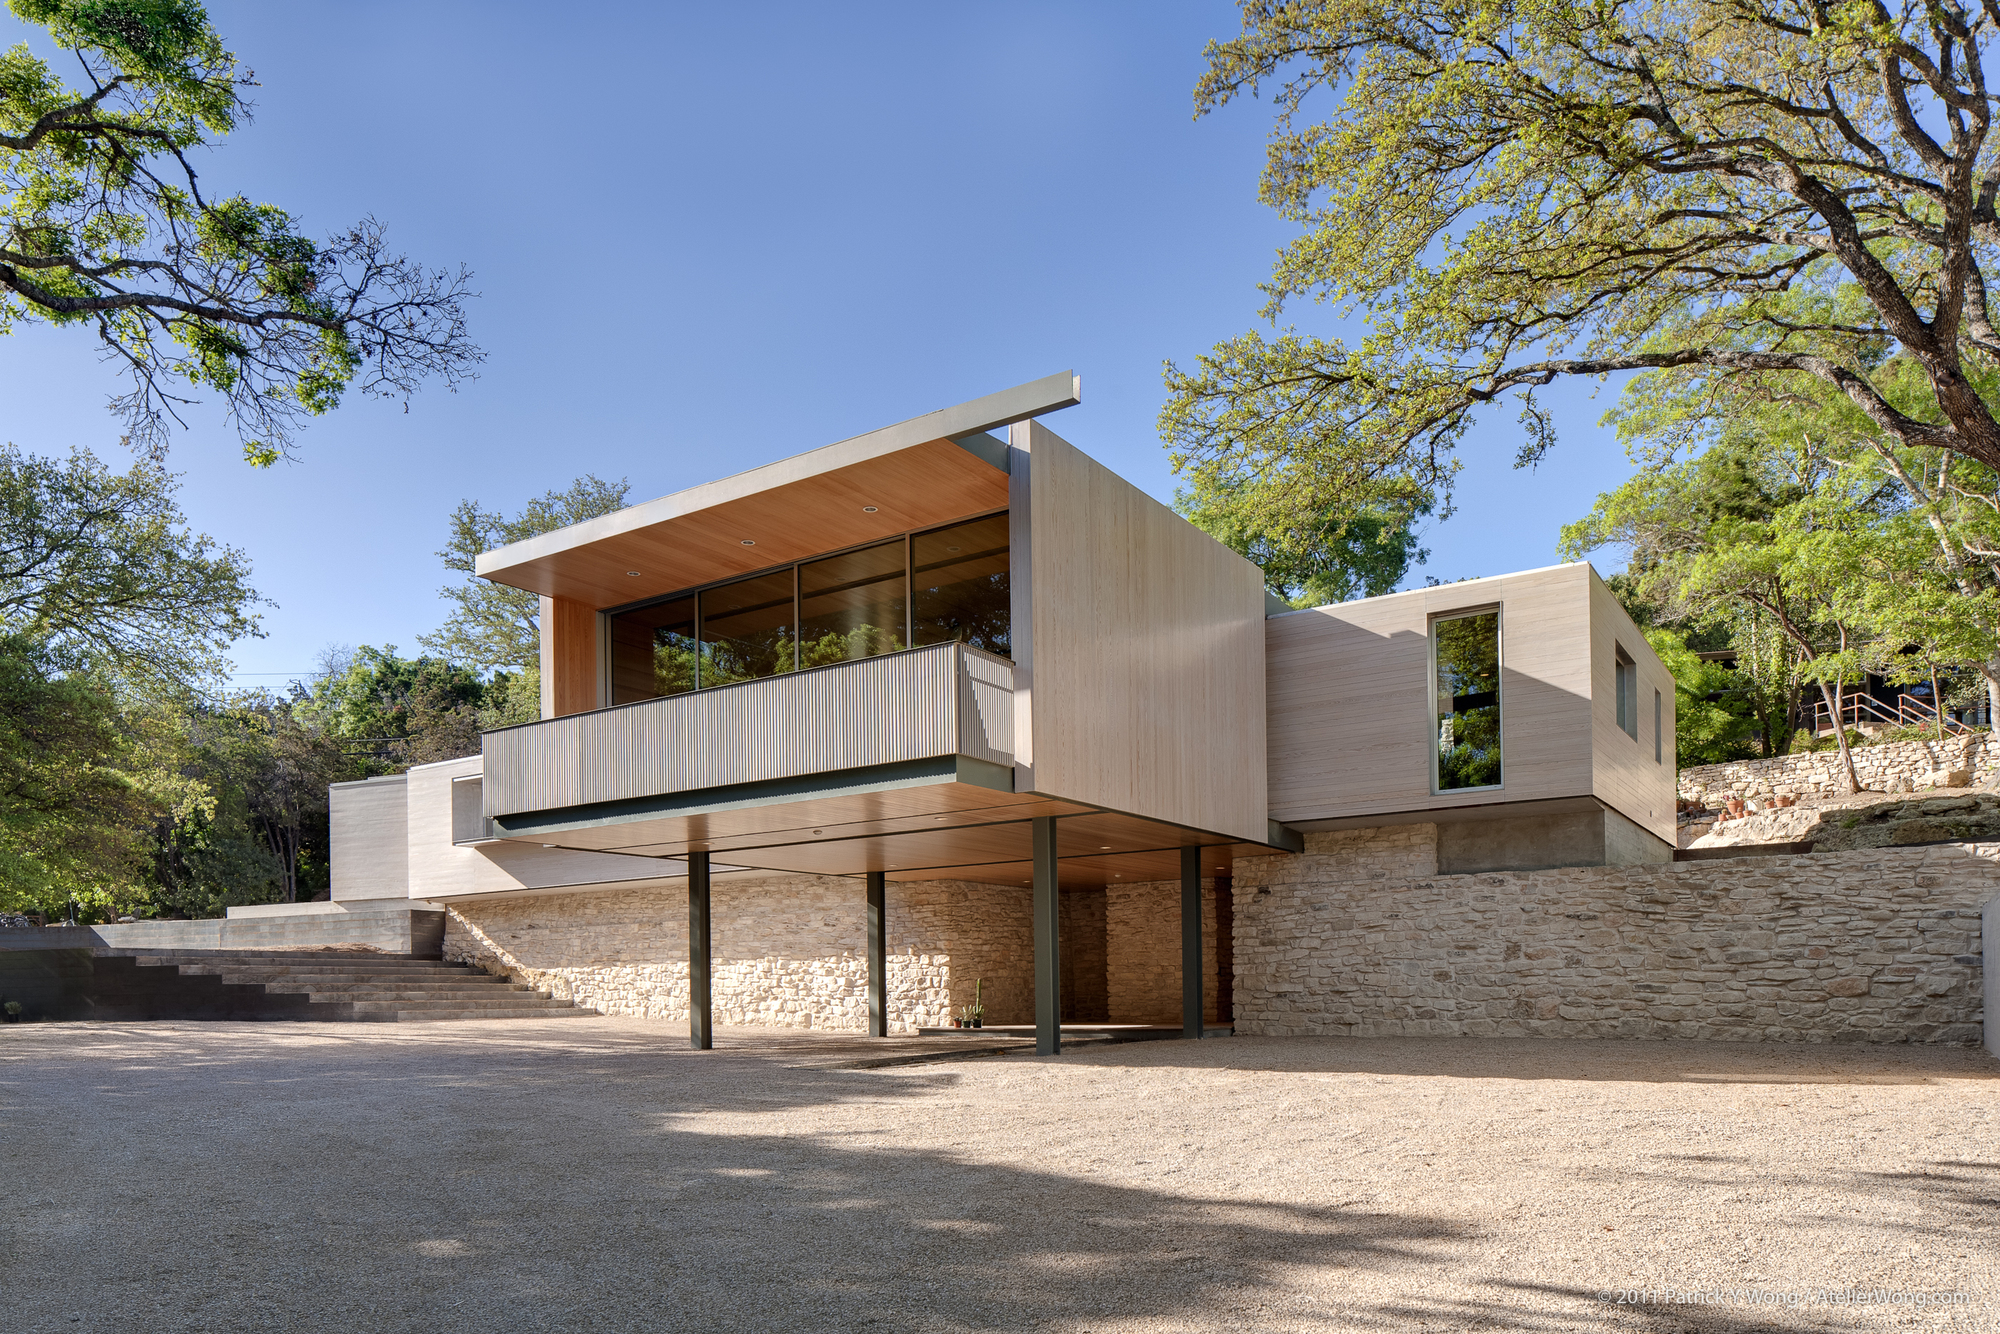 balcones house pollen architecture design archdaily. Black Bedroom Furniture Sets. Home Design Ideas